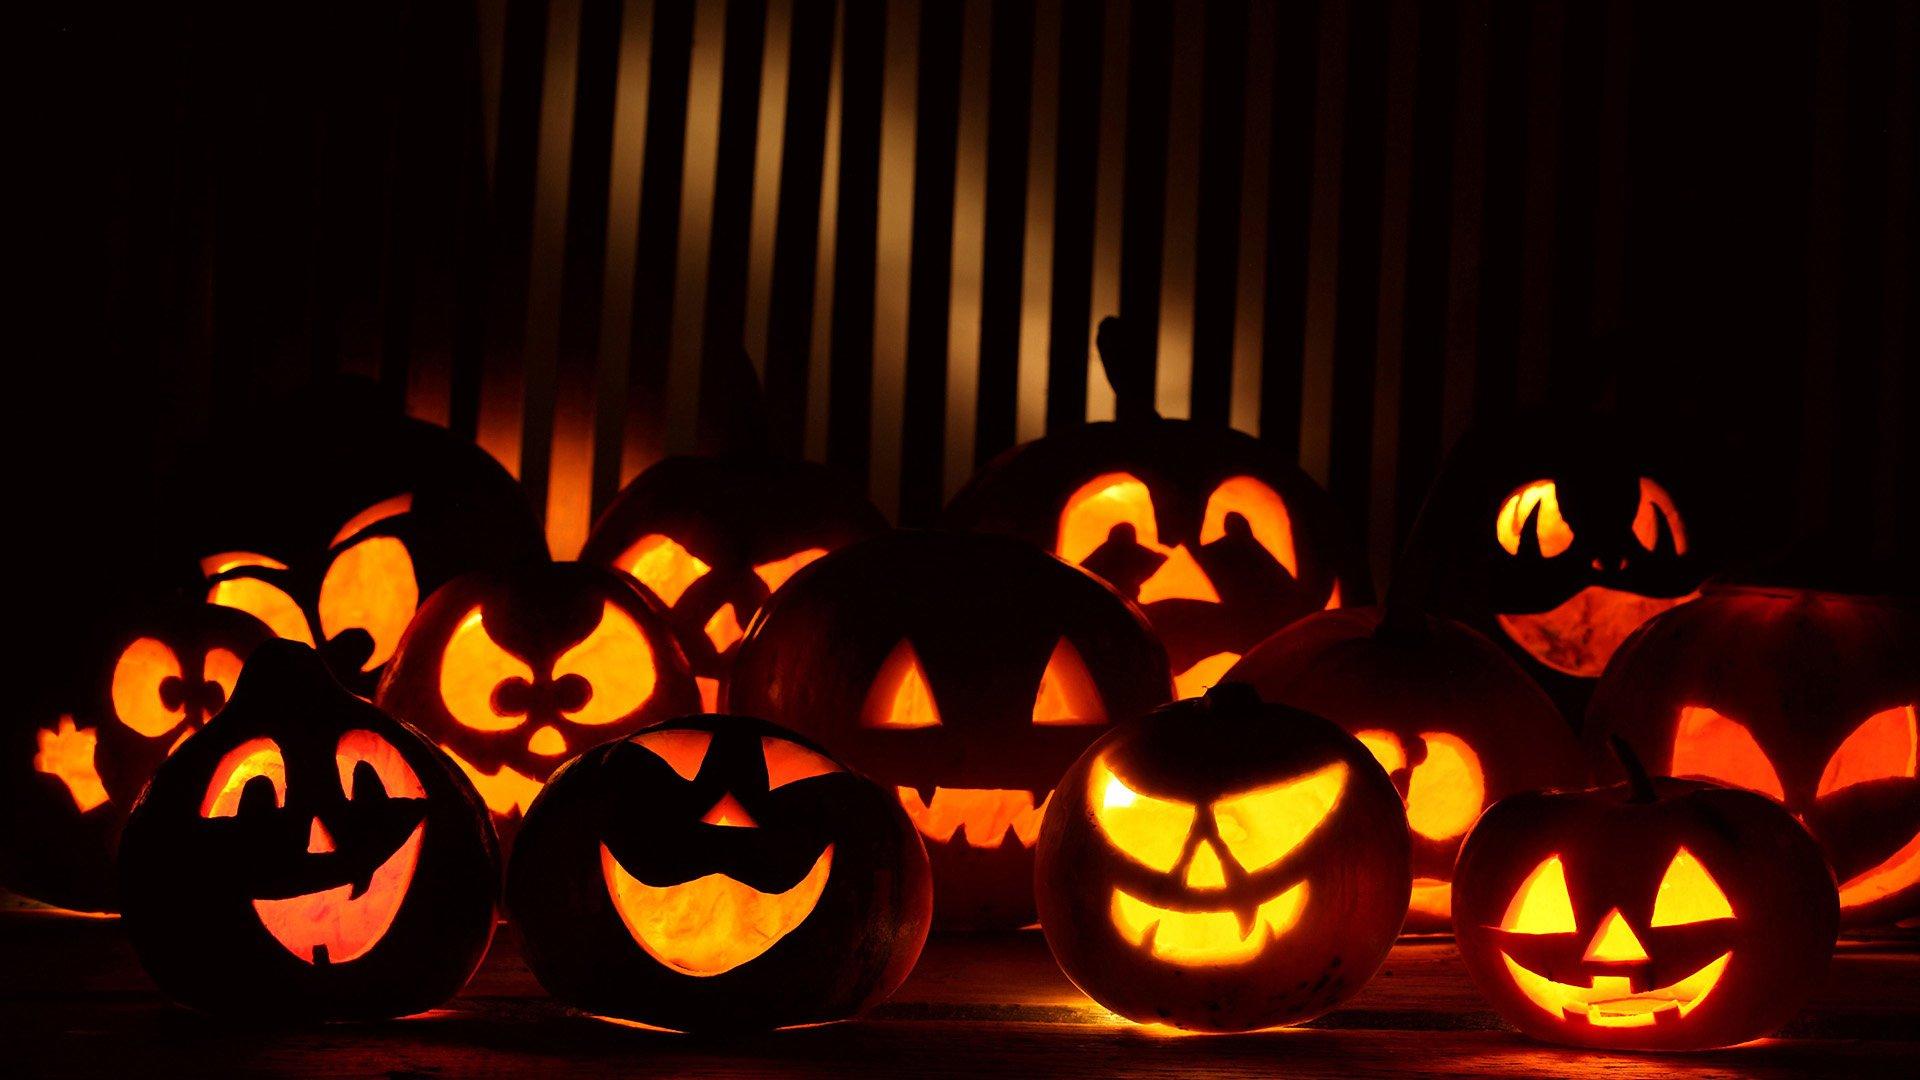 Хэллоуин, тыквы, праздники, hd обои